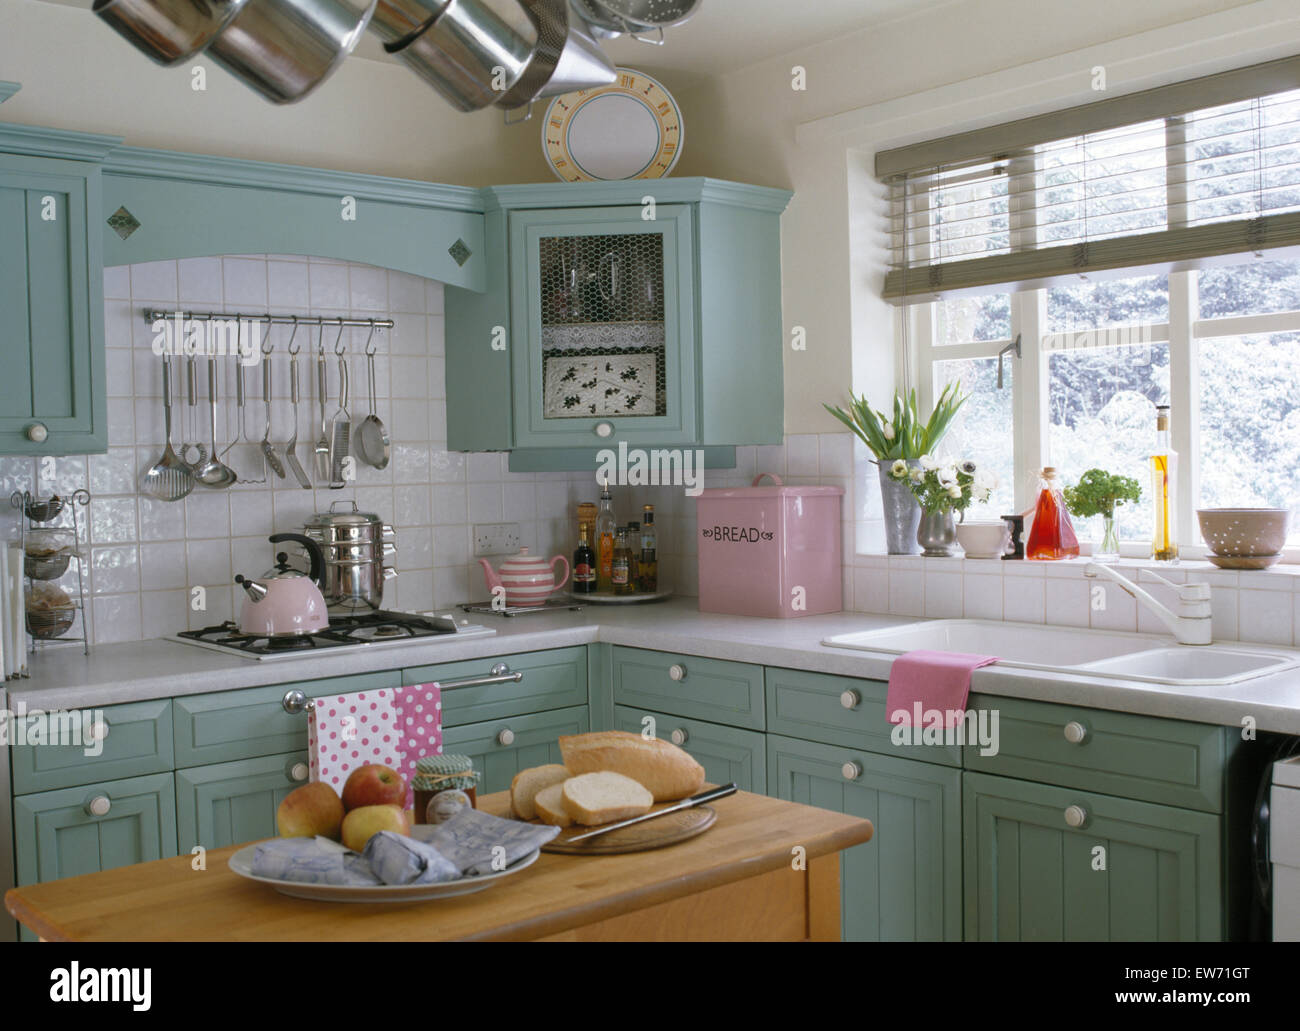 Smeg Kühlschrank Pastel : Kitchen pastel pastels stockfotos & kitchen pastel pastels bilder